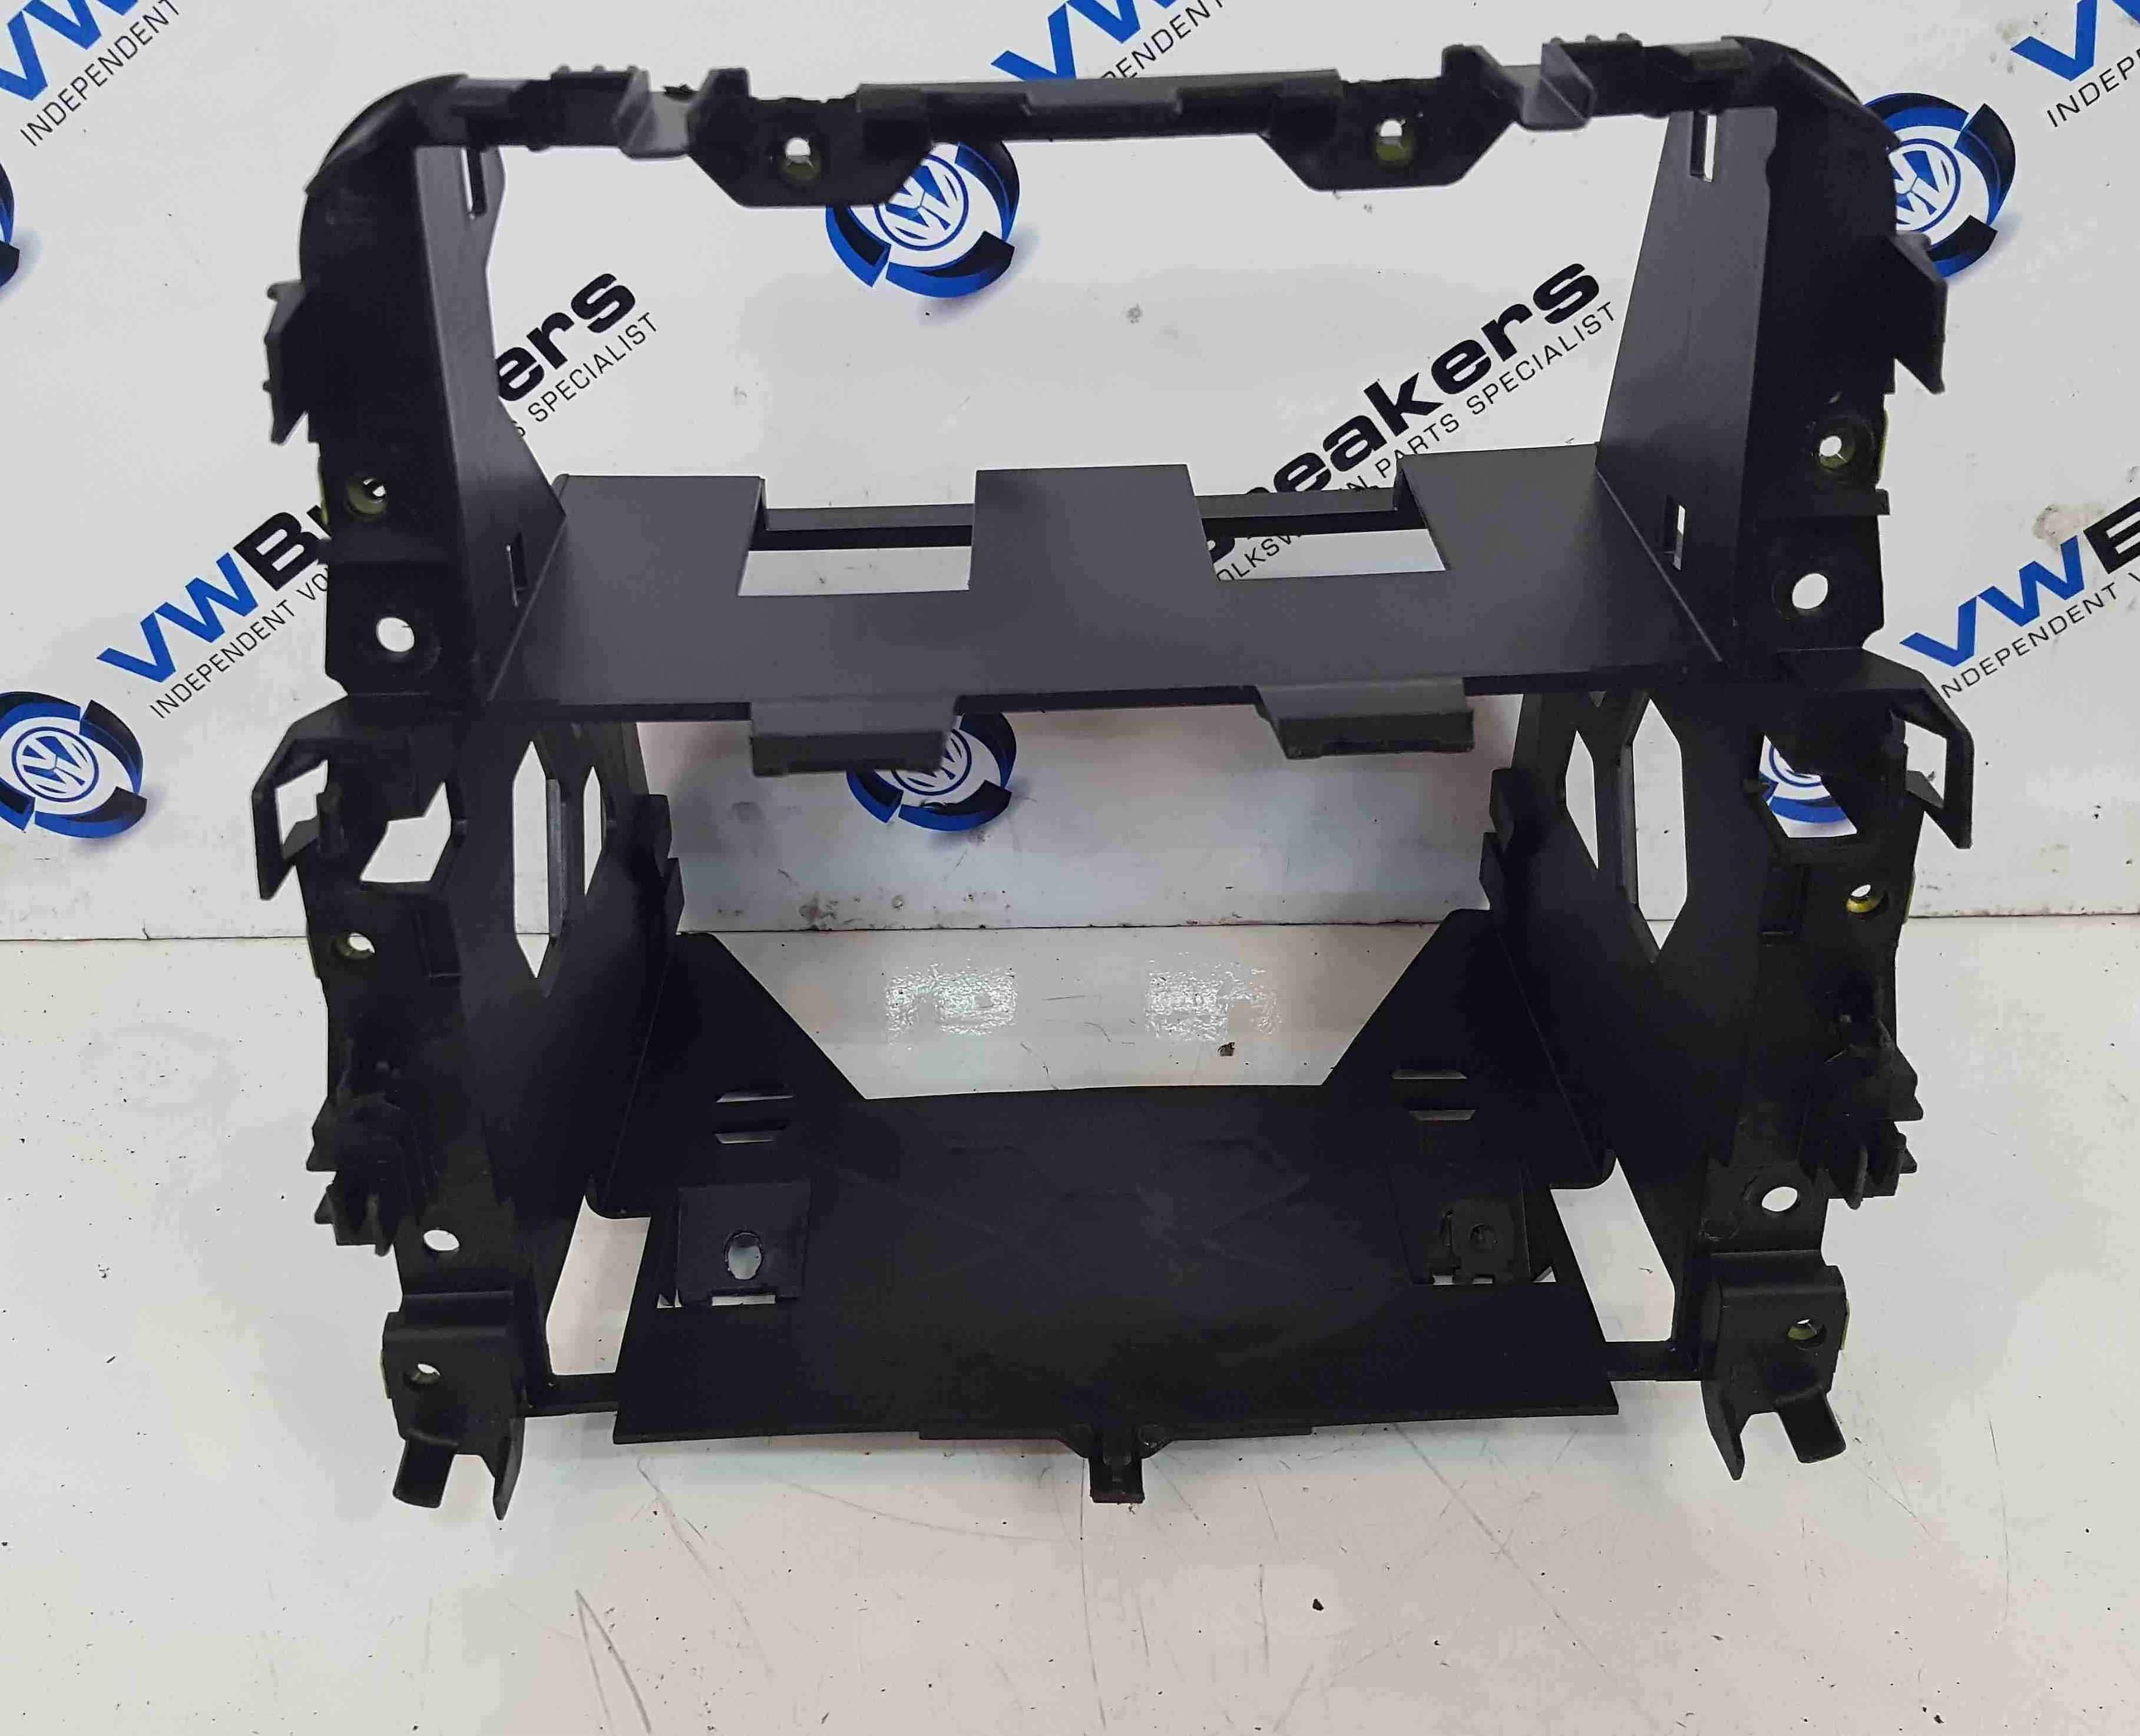 Volkswagen Scirocco 2008-2014 Radio Stereo Head Unit Cage Bracket Mount